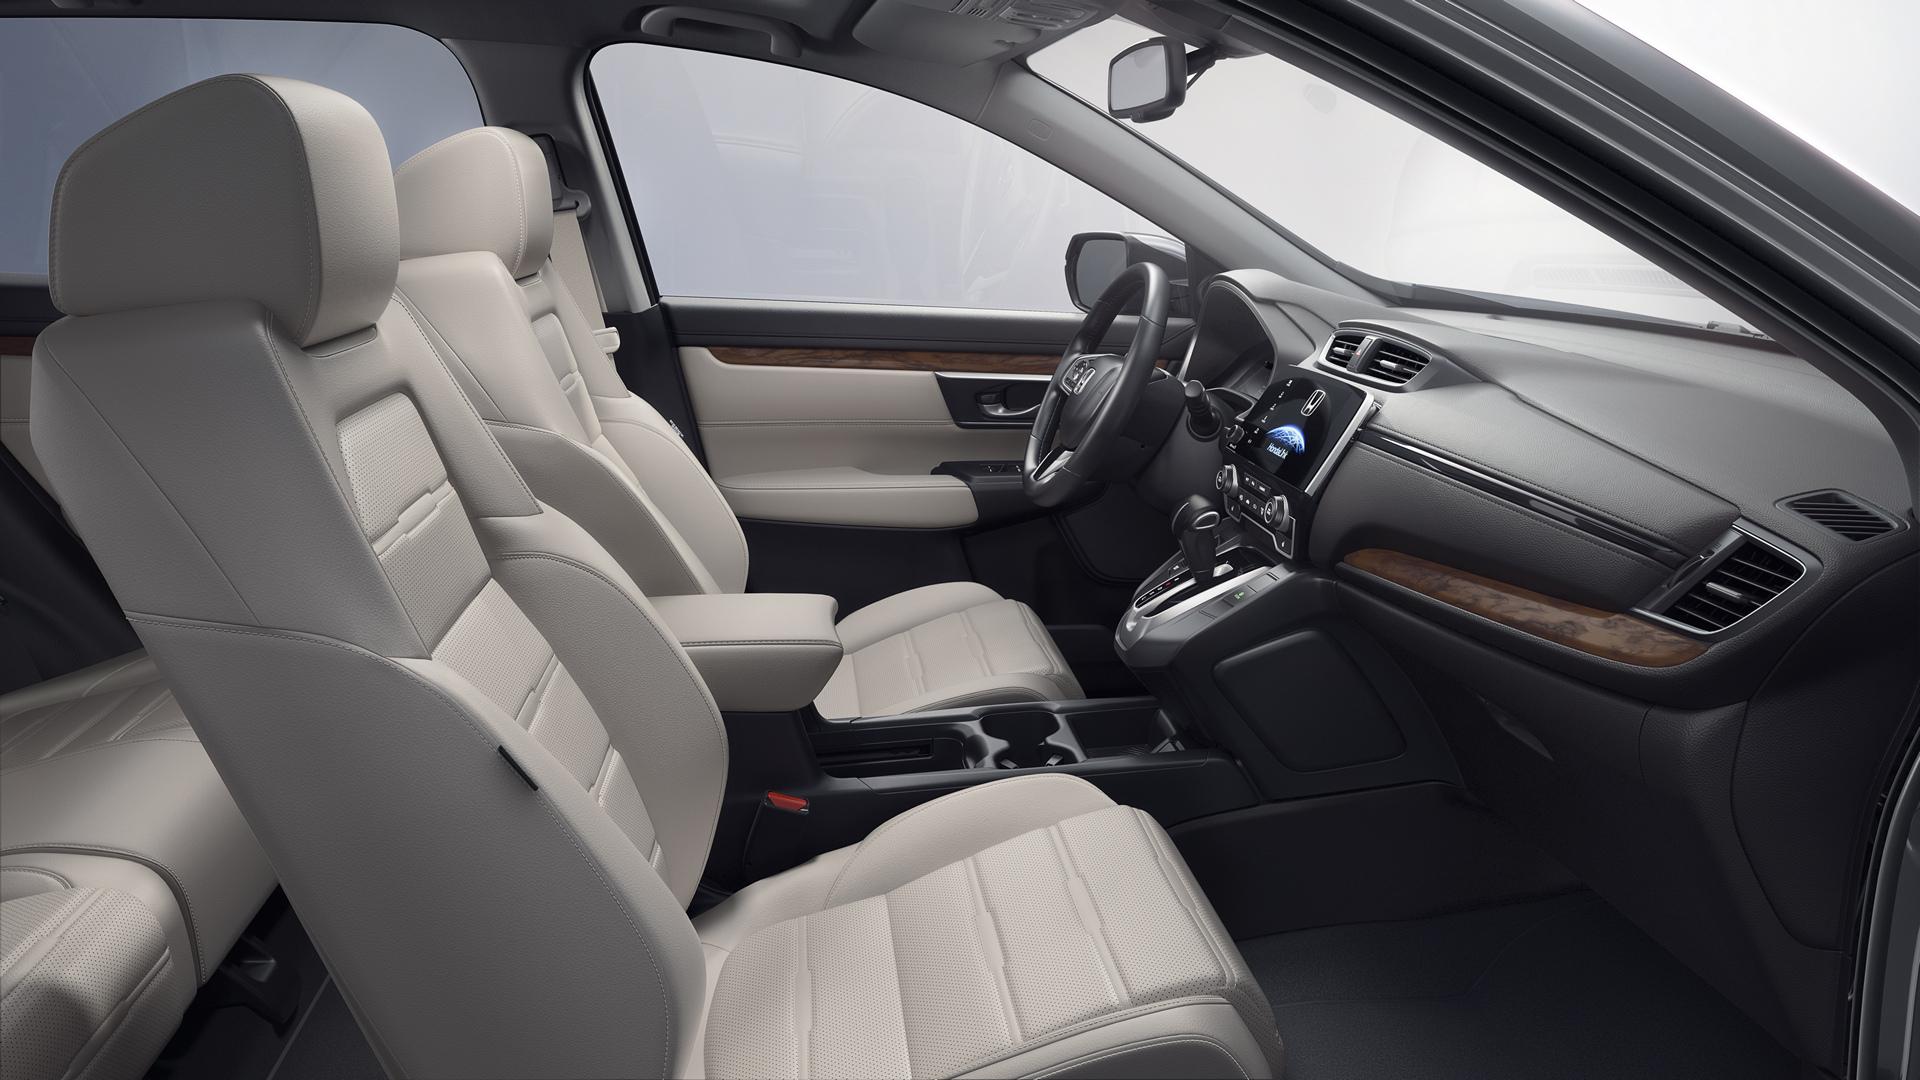 2017 Honda CR-V © Honda Motor Co., Ltd.